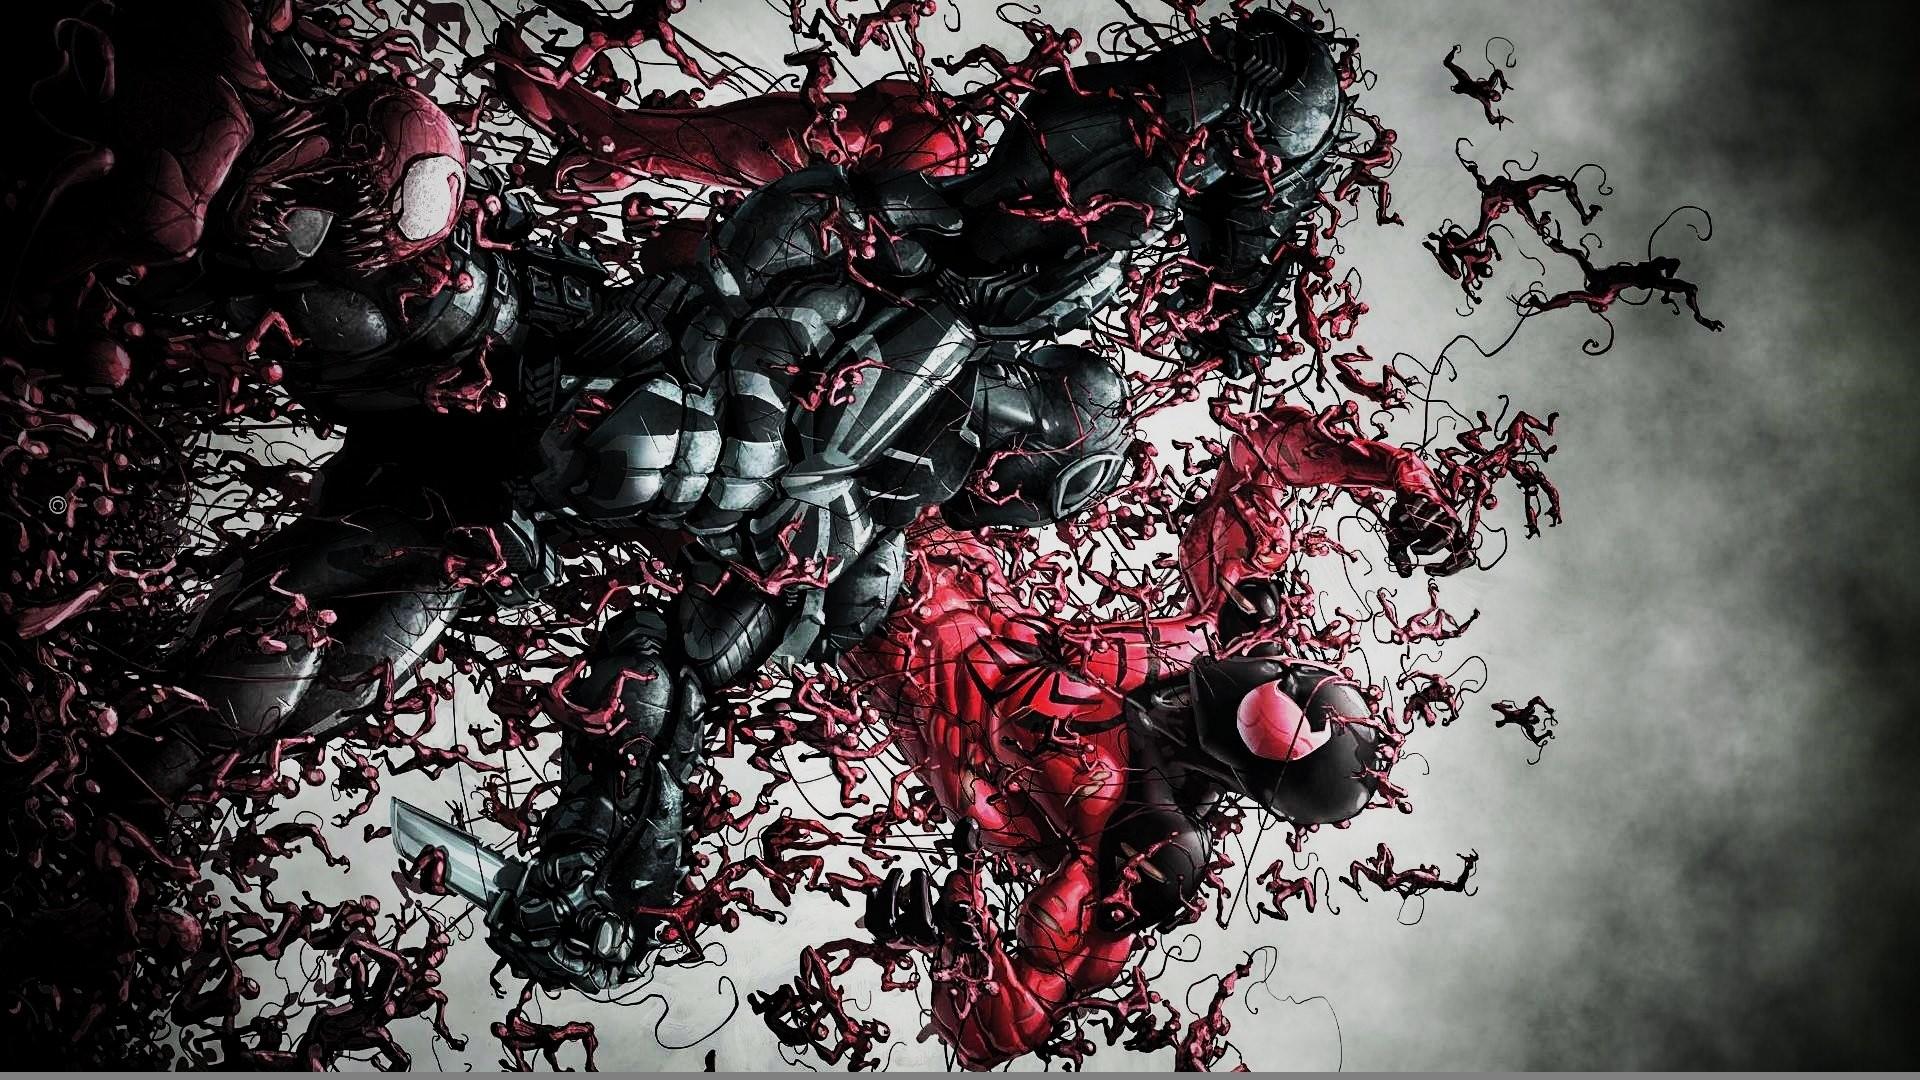 Agent Venom Vs The Scarlet Spider wallpaper | | 615740 .